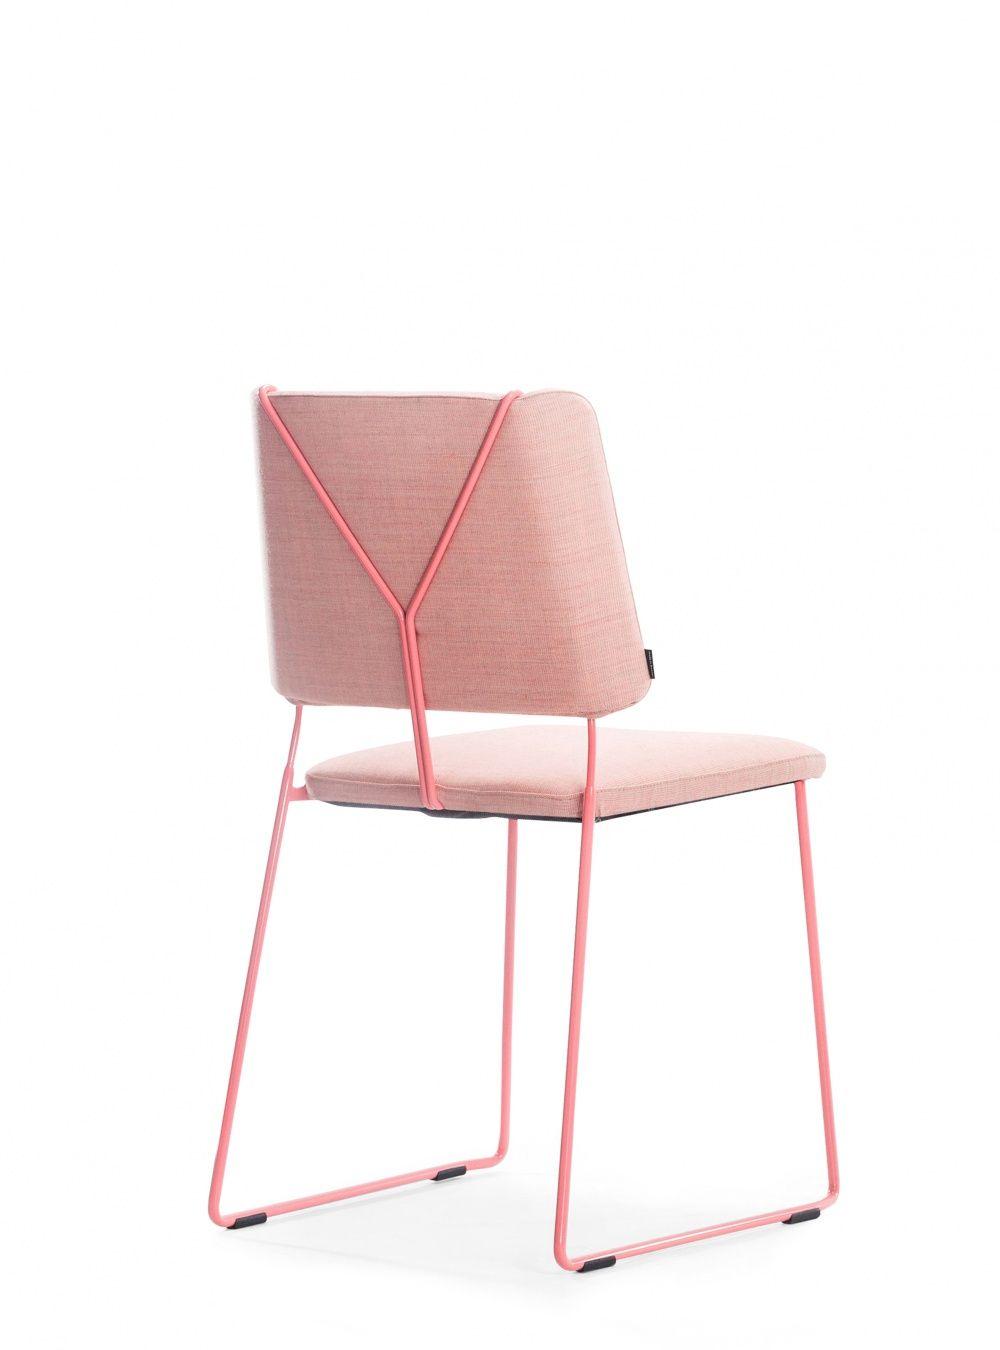 Johanson Design Frankie A Chair With Braces Chair Furniture Decor